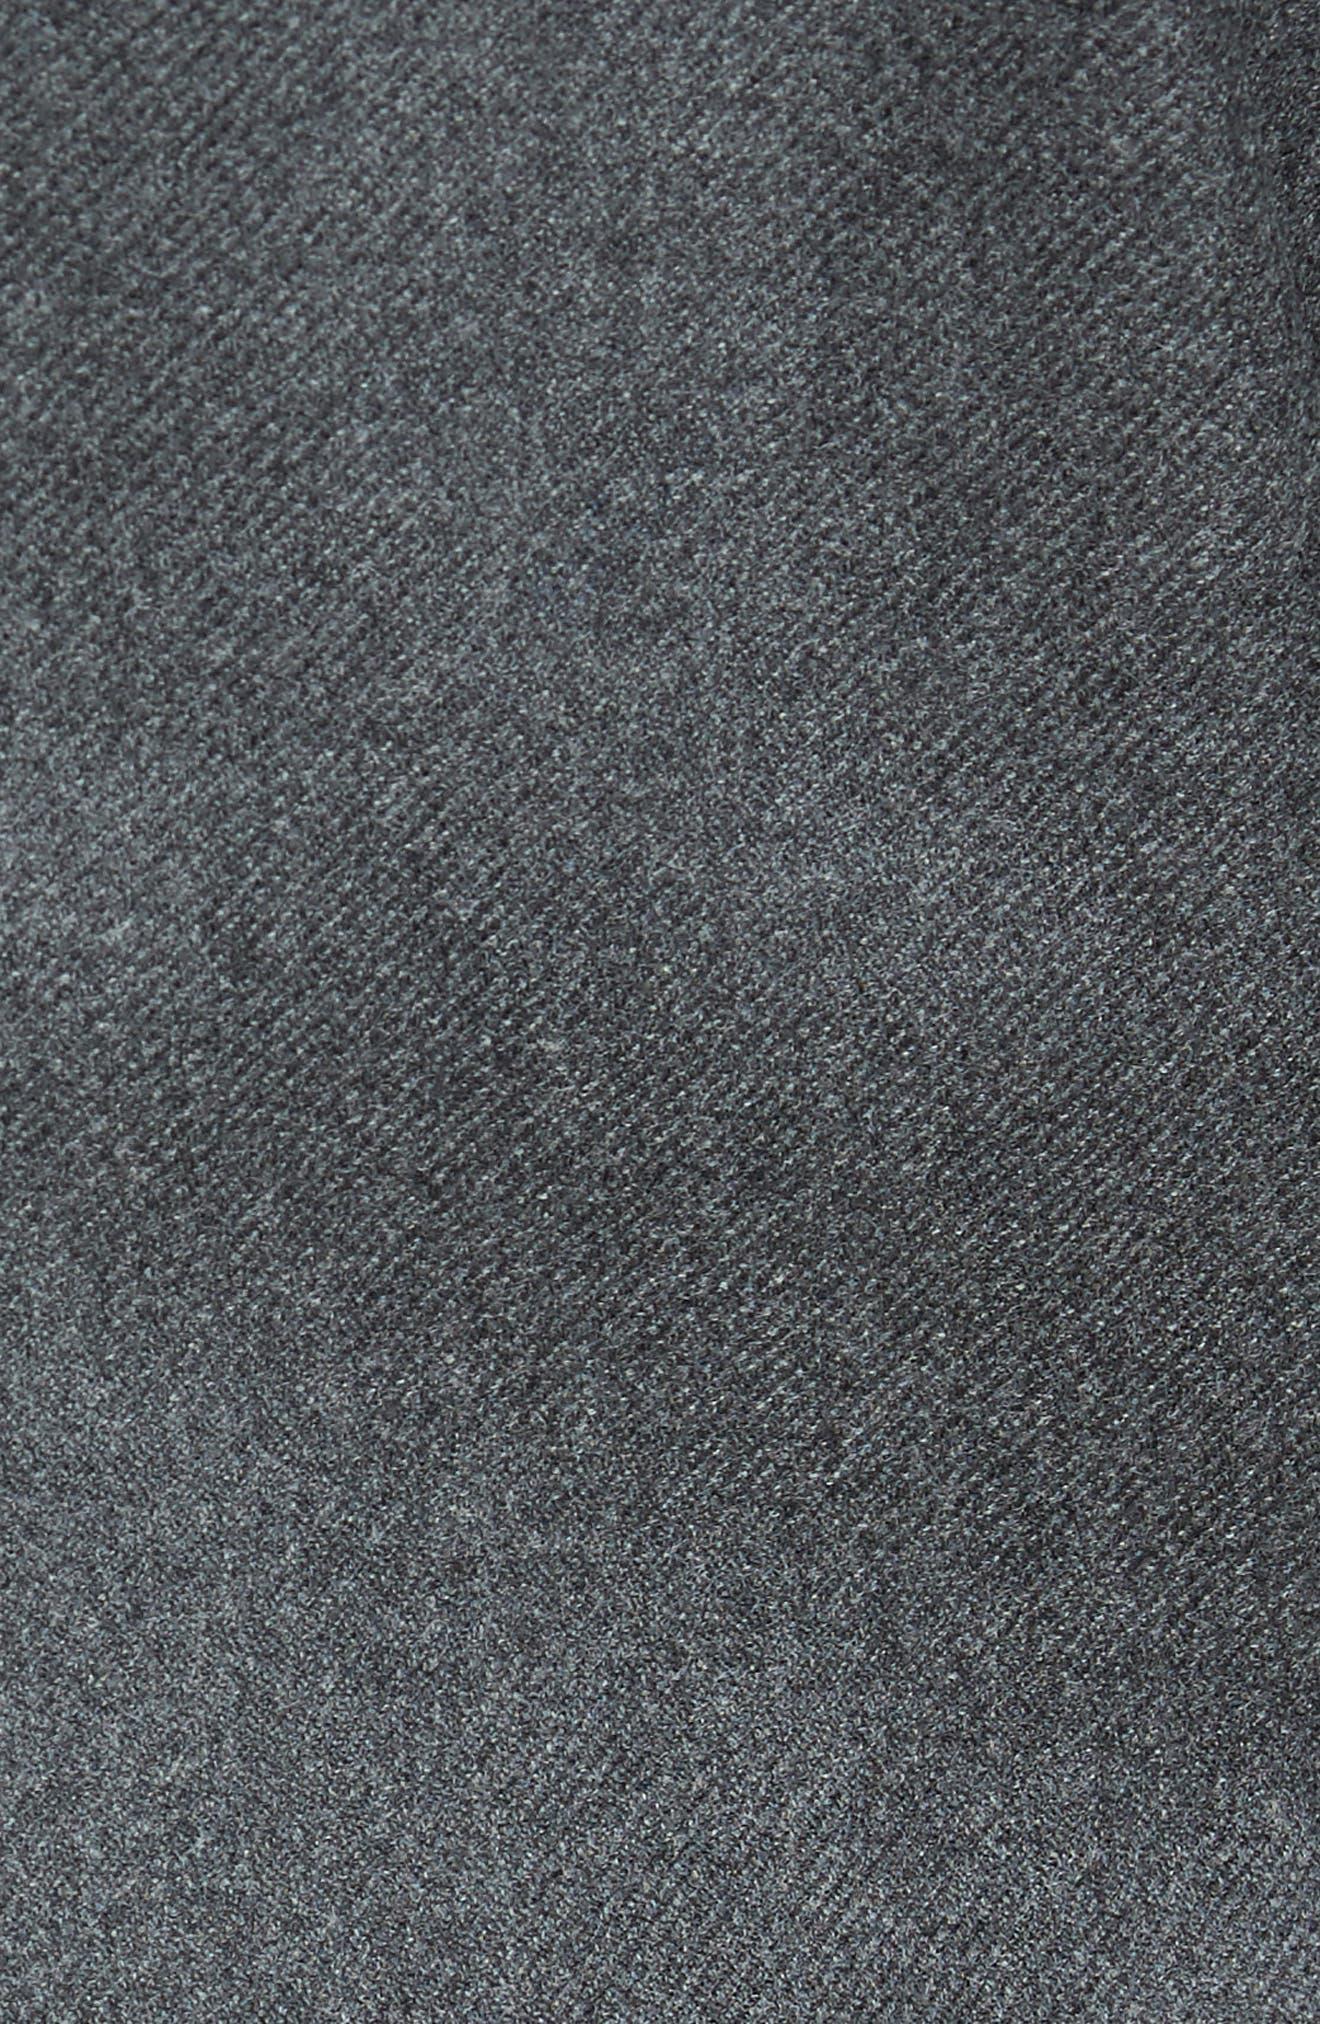 Alternate Image 5  - David Donahue Loro Piana Storm System Shirt Jacket